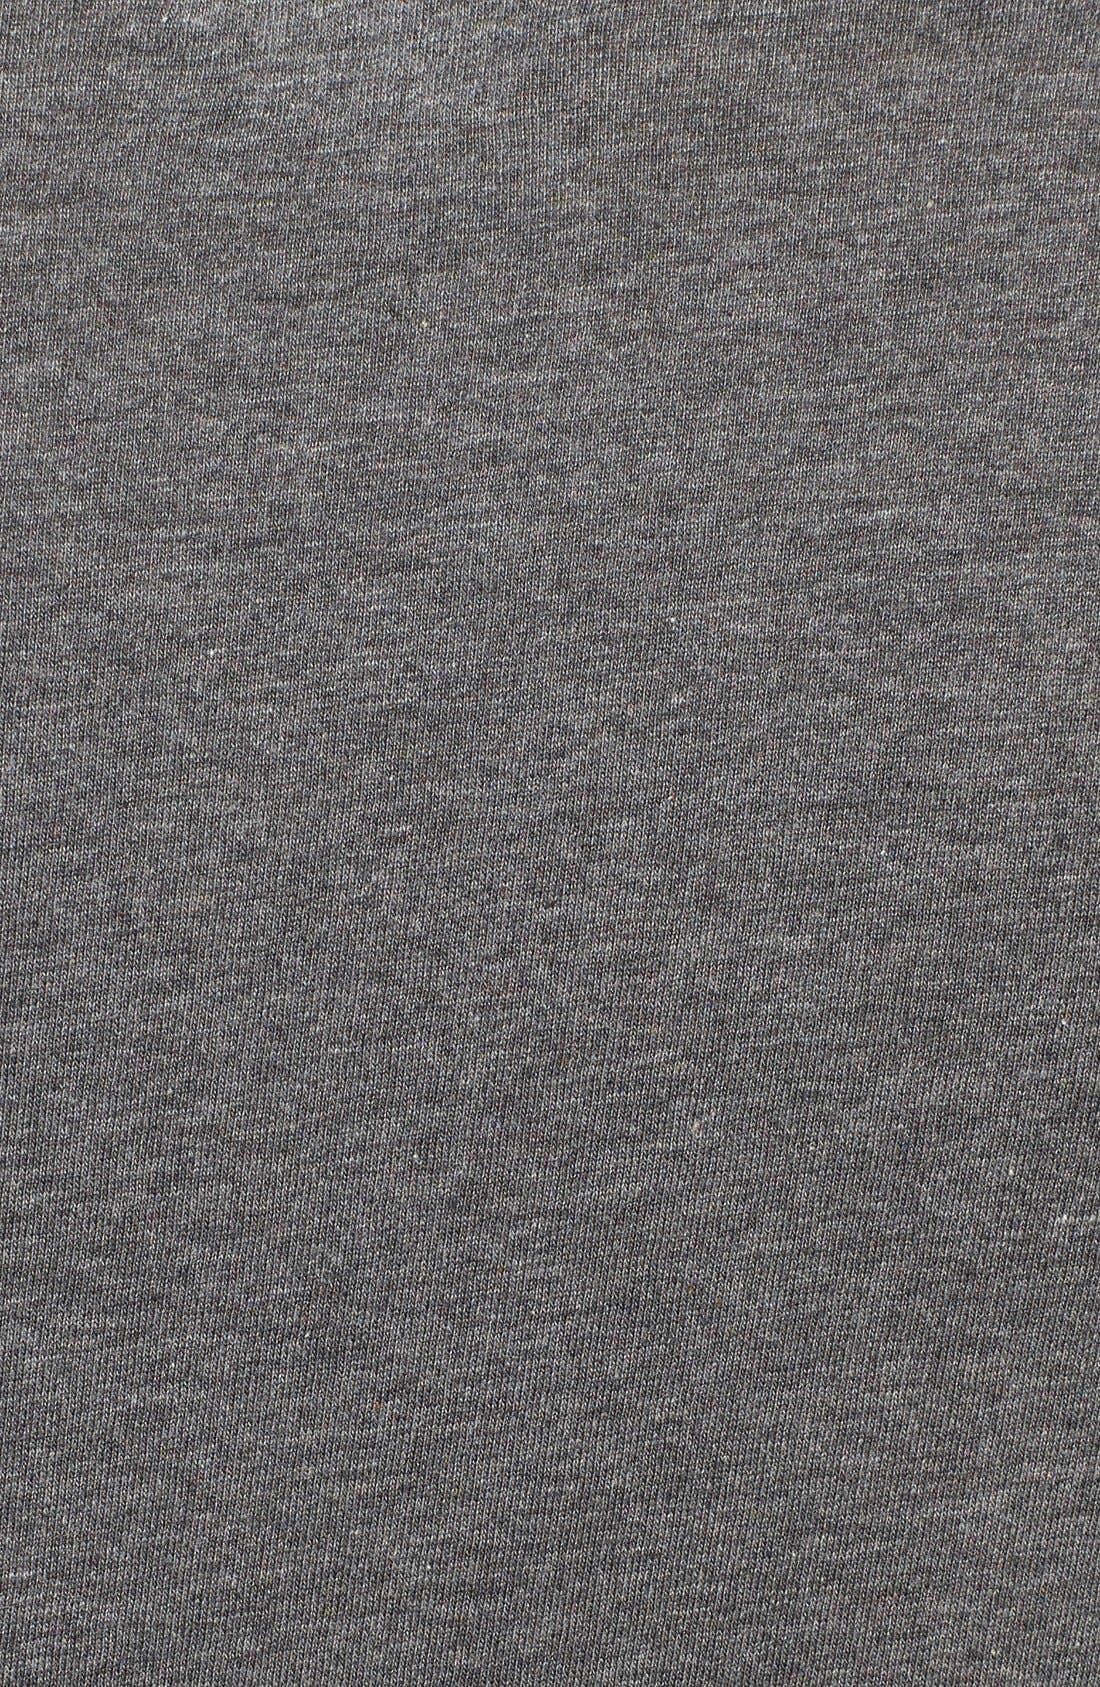 Alternate Image 5  - Polo Ralph Lauren 3-Pack Slim Fit T-Shirt